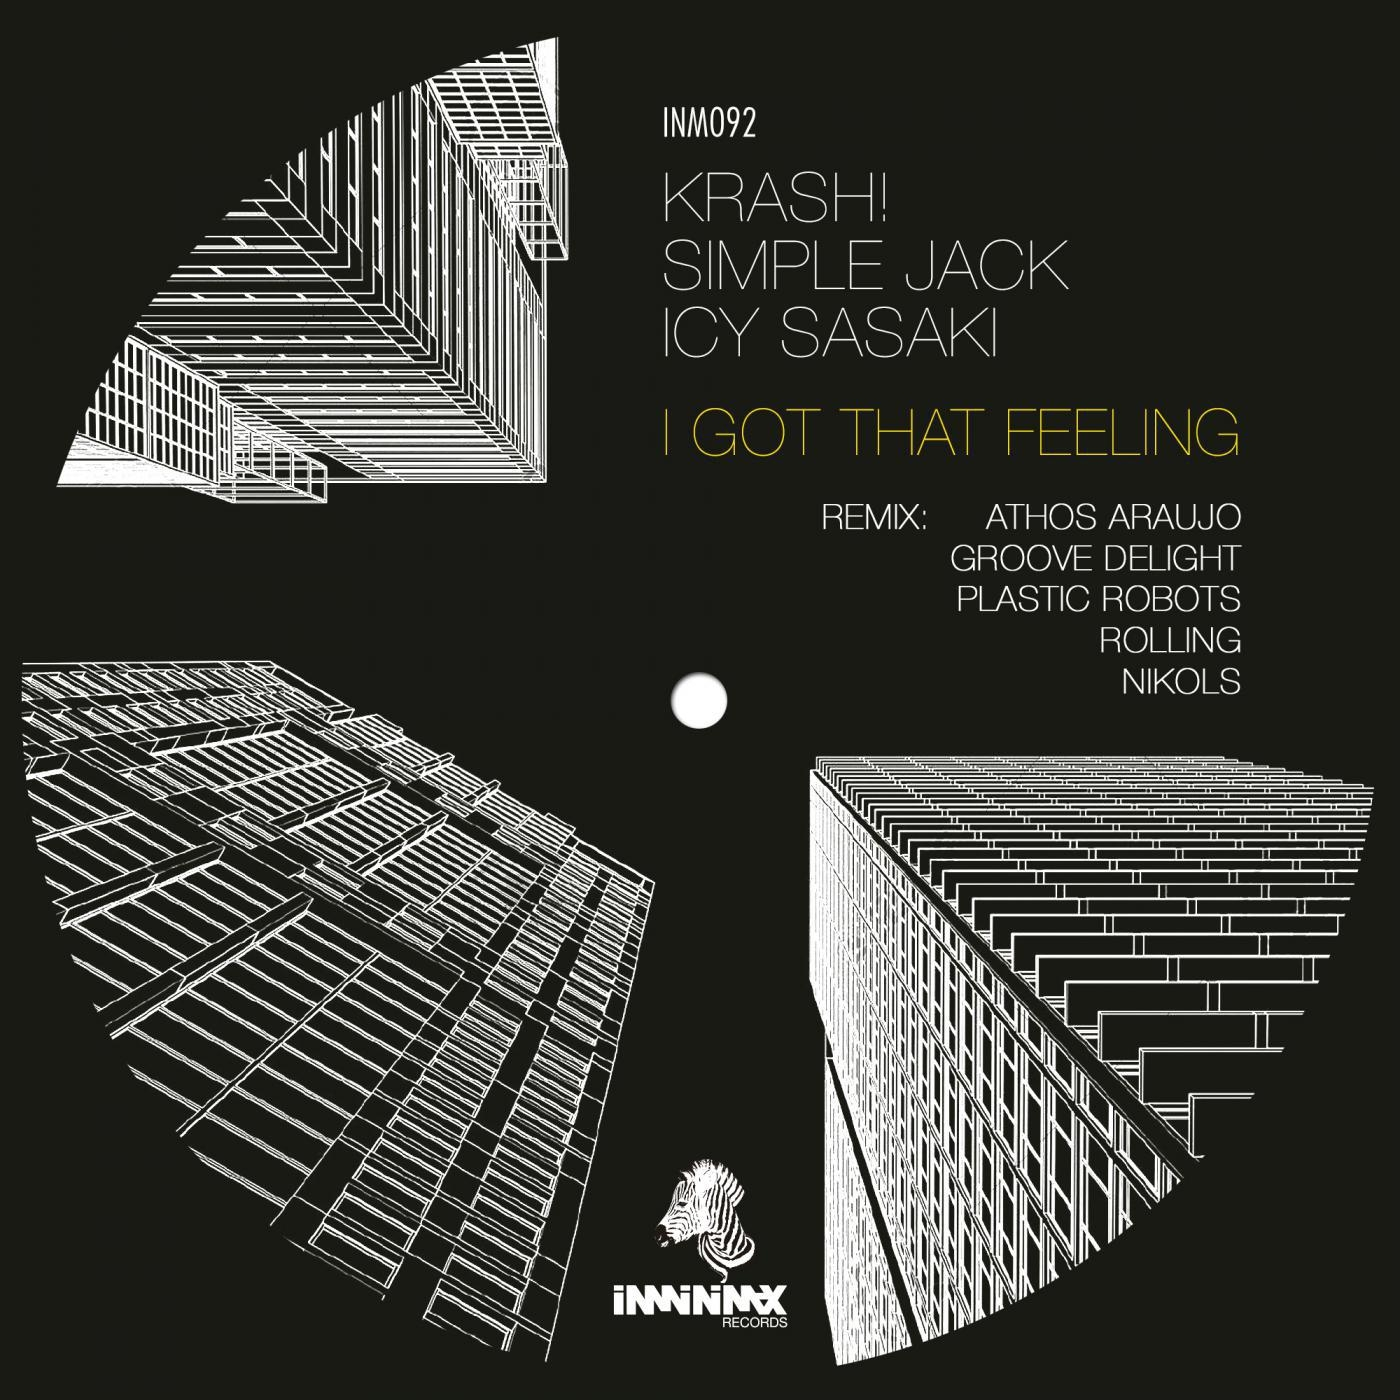 Icy Sasaki & KRASH! & Simple Jack - I Got That Feeling (Groove Delight Remix)